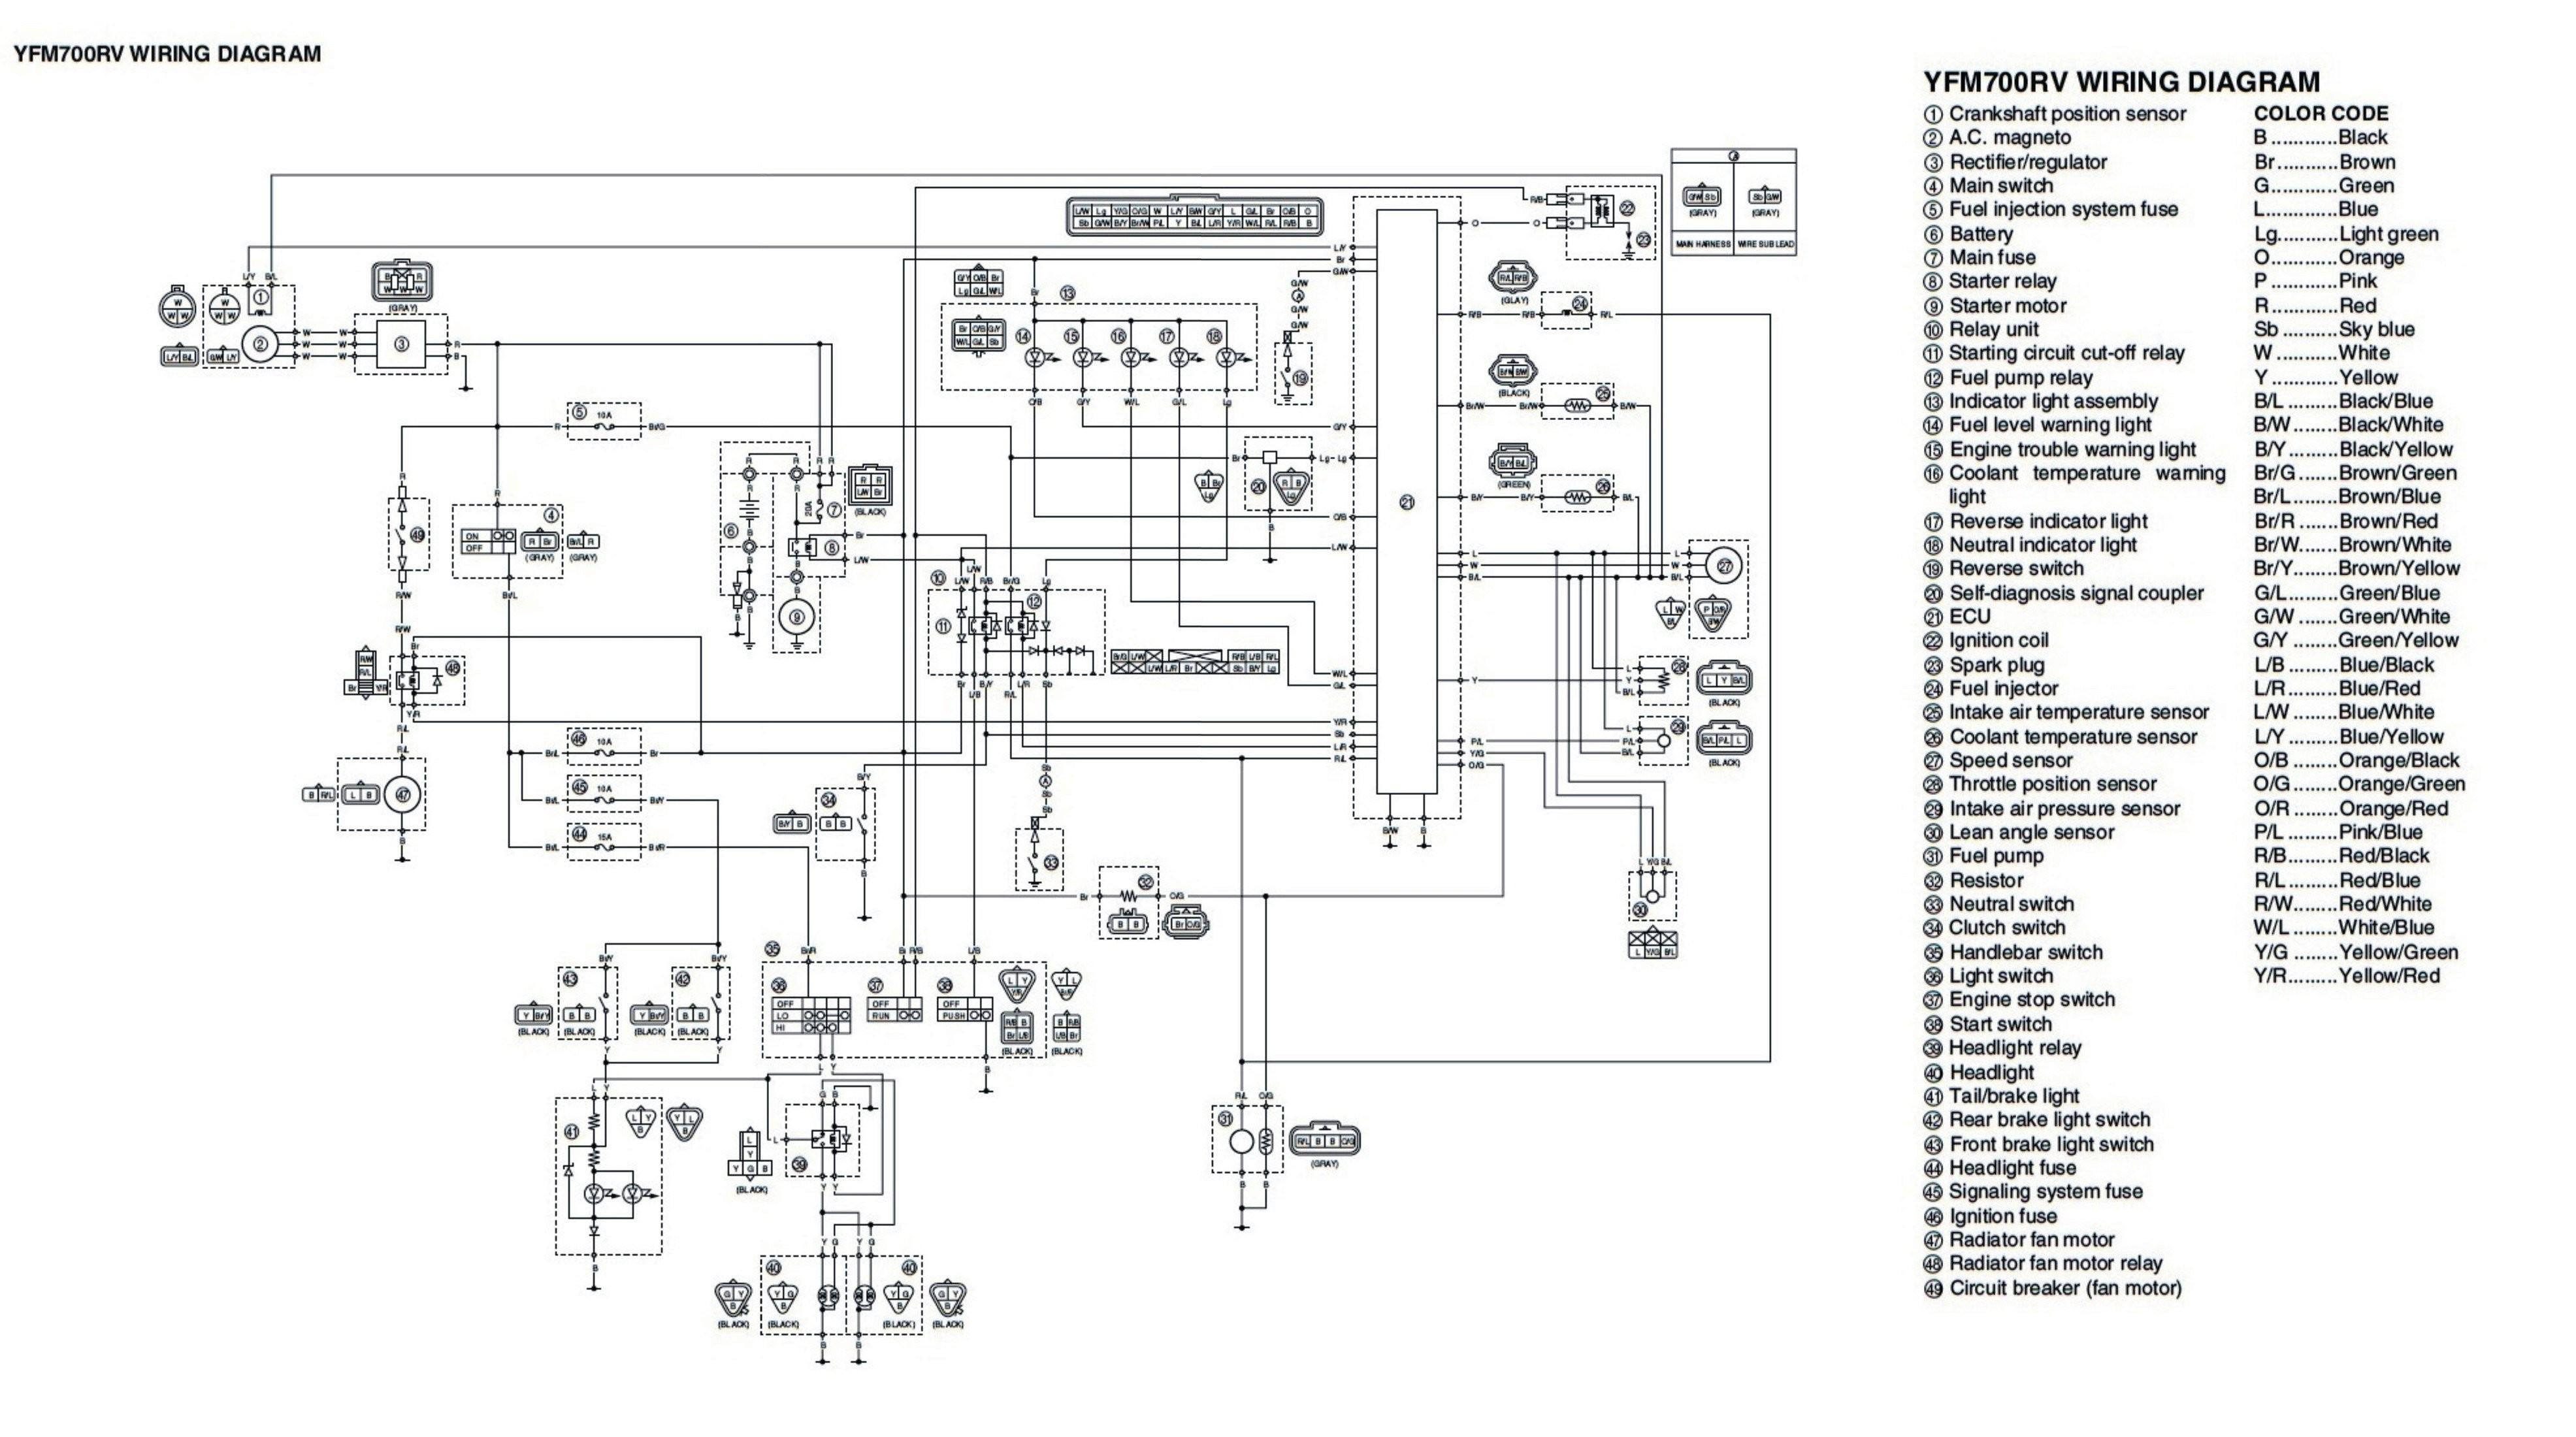 07 gsxr 600 fuel pump wiring diagram 98 jeep wrangler speaker 2002 1000 my